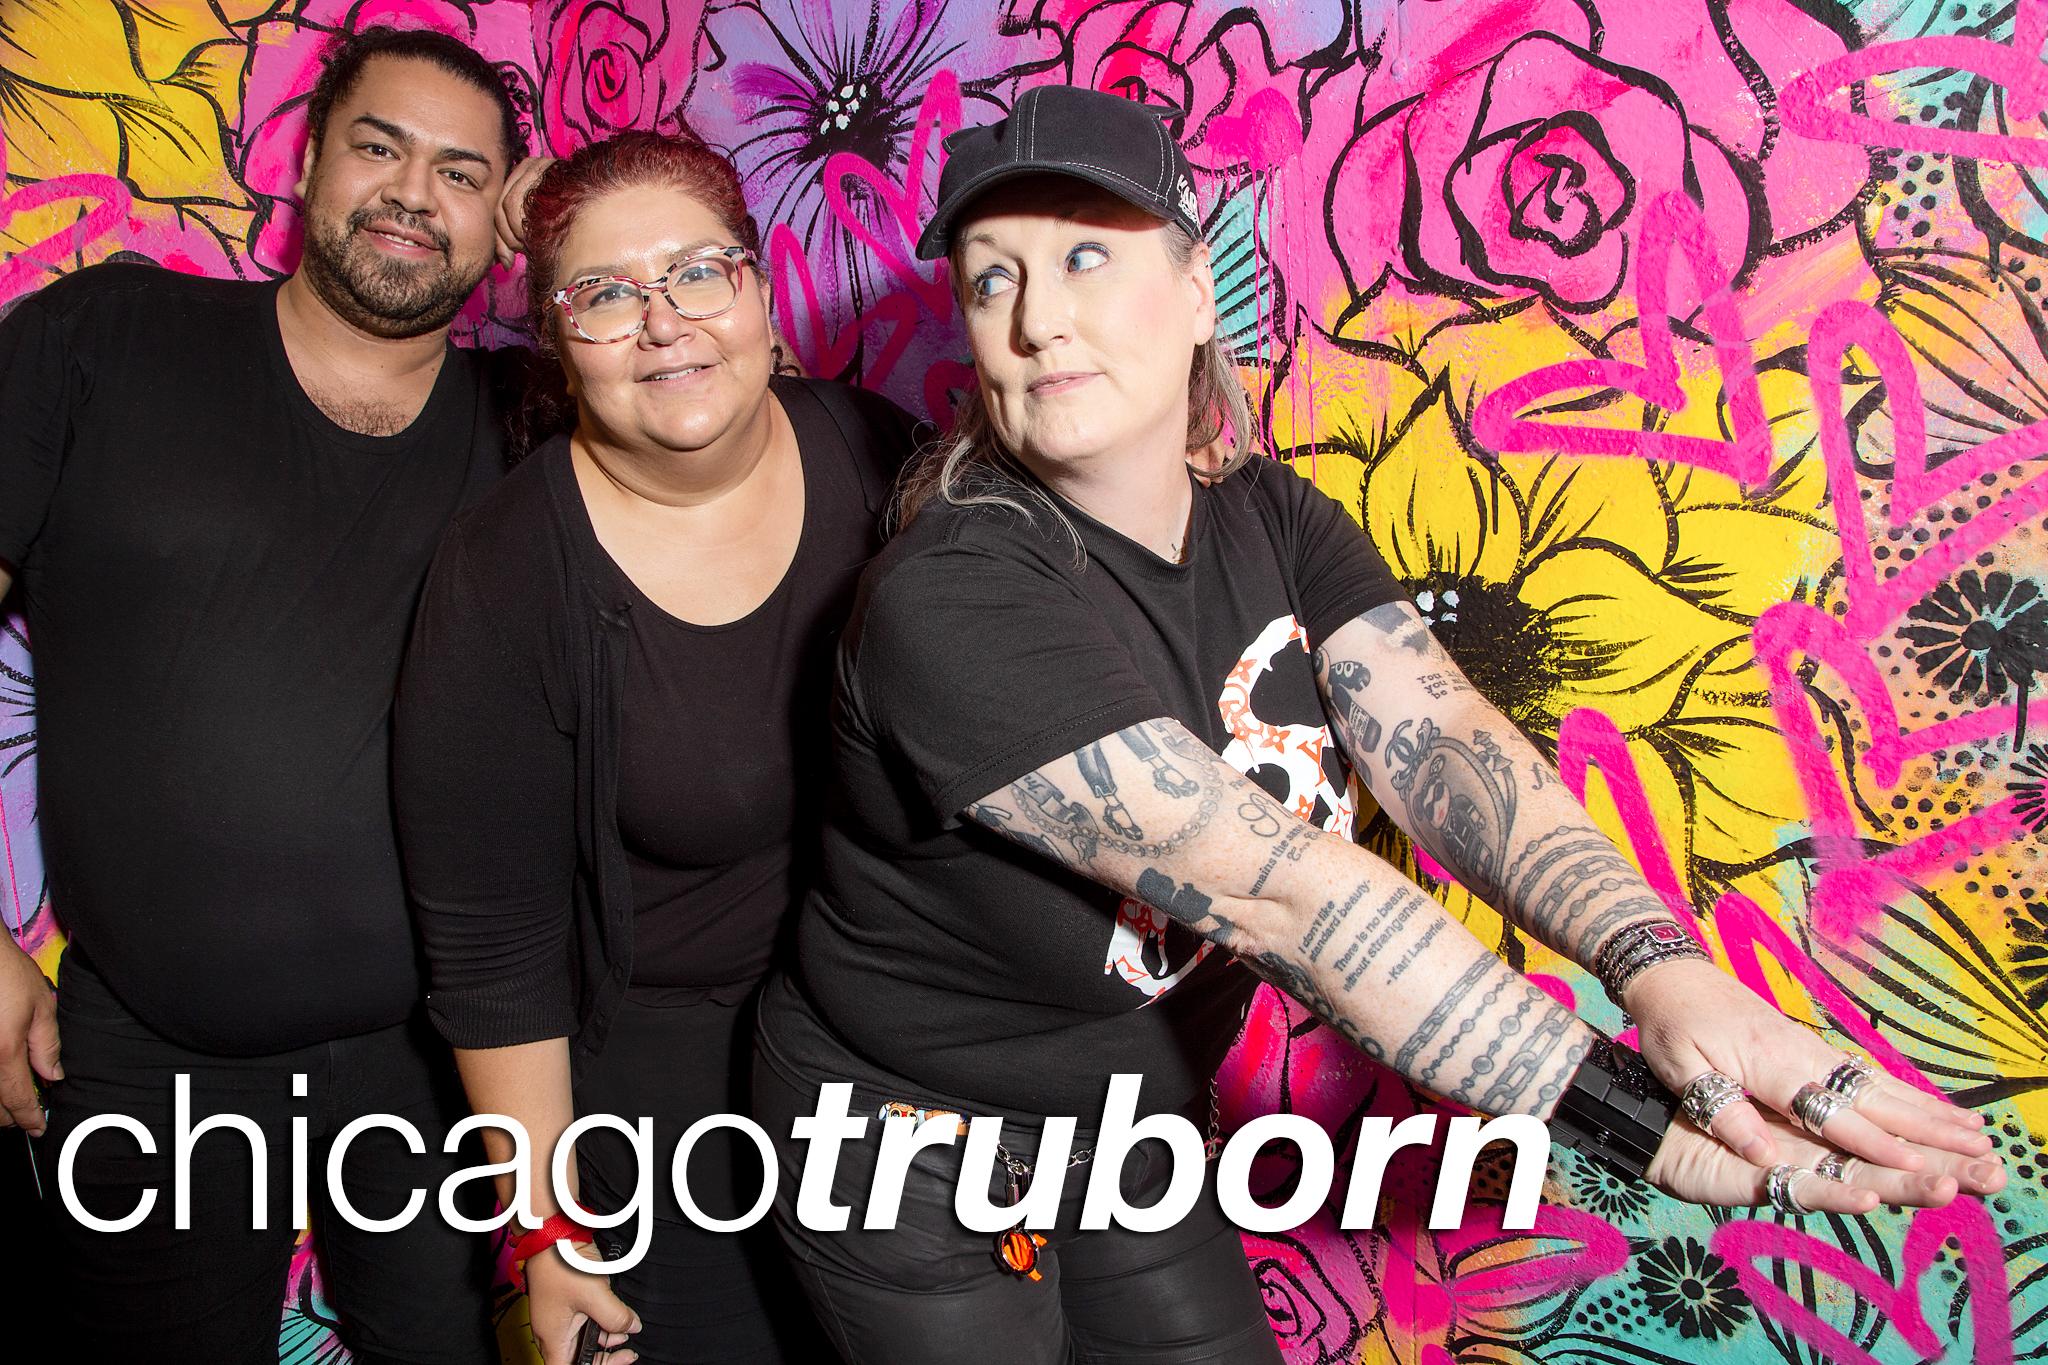 glitterguts portrait booth photos from chicago truborn's 8th anniversary, glitterguts 2021